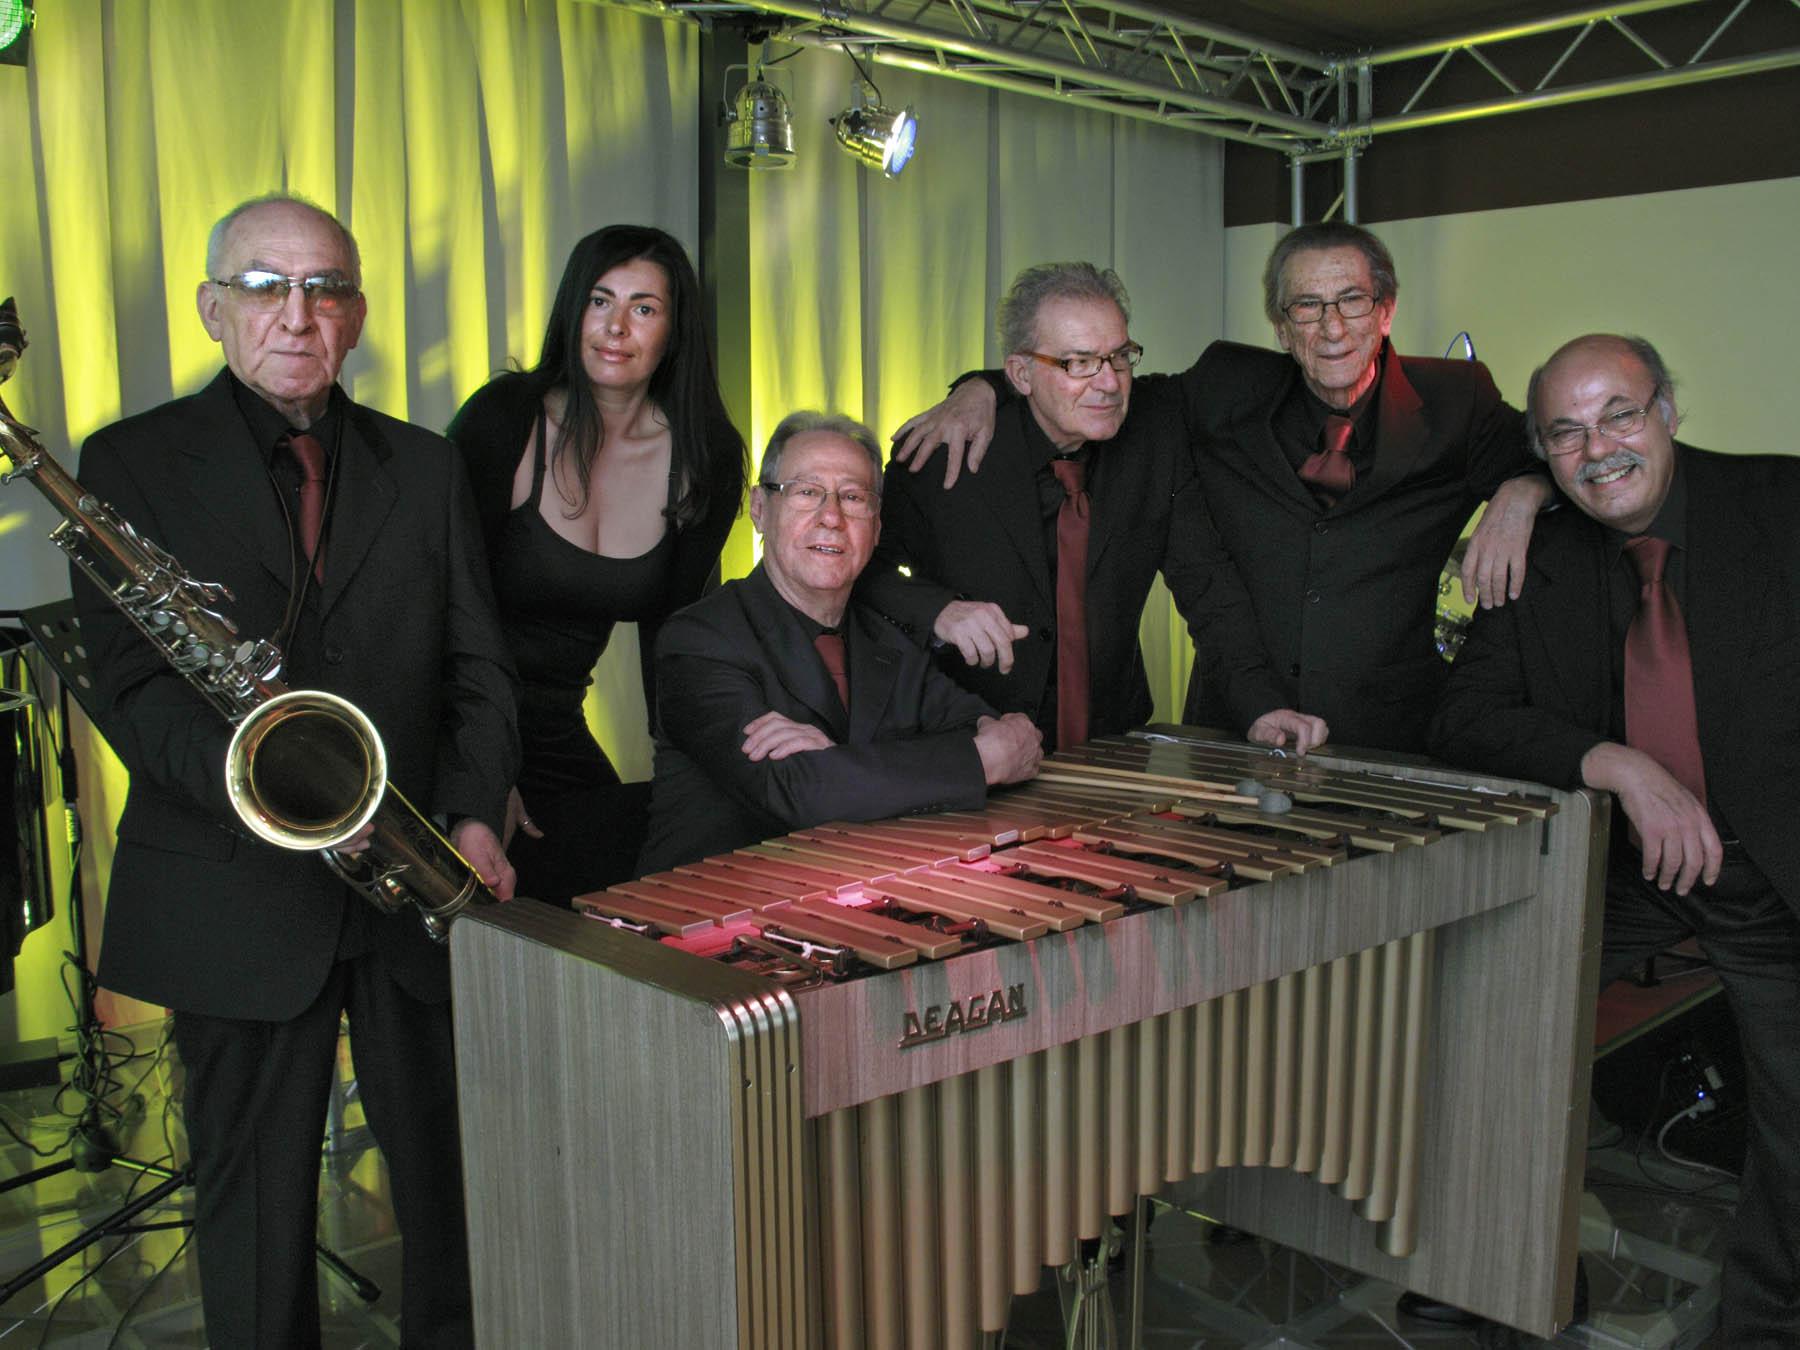 The Old Five Swingers plus Edy